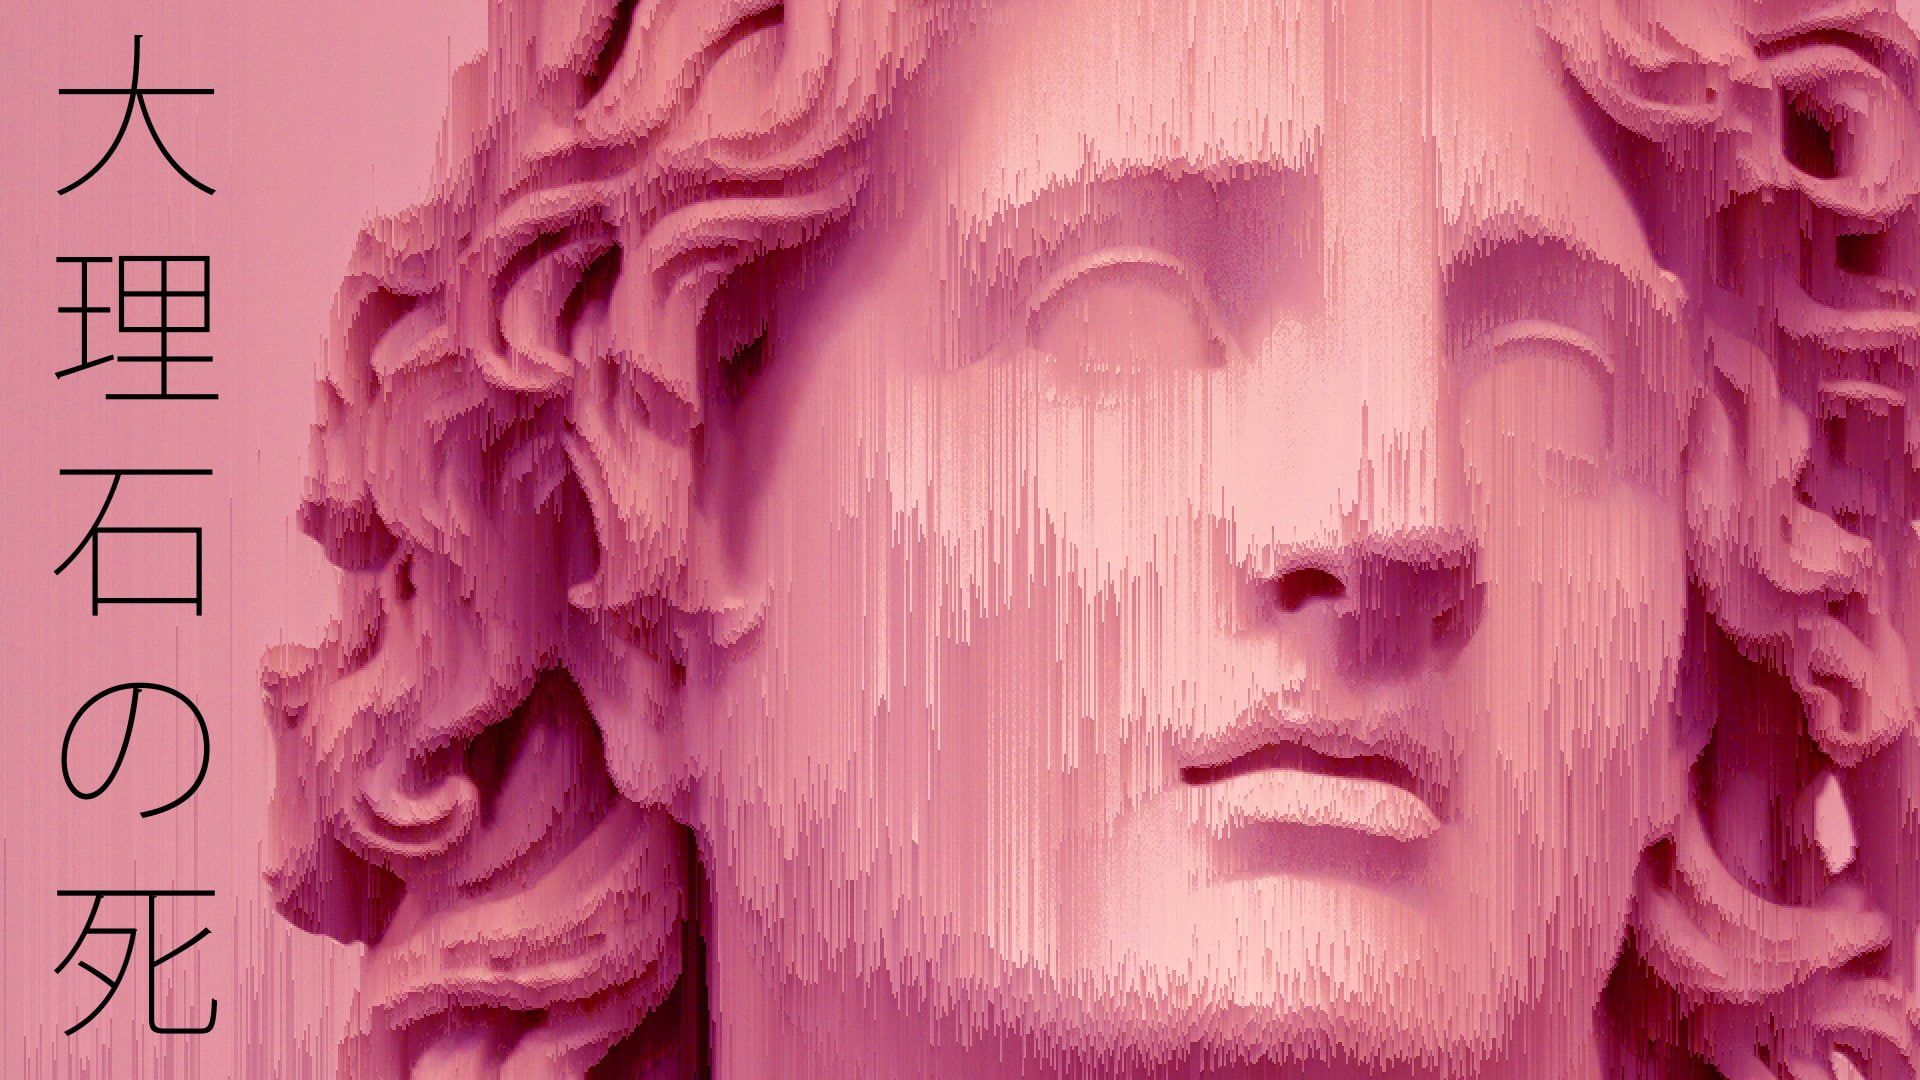 Artistic Vaporwave Greek Music Pink Statue Trippy 1080p Wallpaper Hdwallpaper Desktop Vaporwave Wallpaper Vaporwave Vaporwave Style Greece aesthetic desktop wallpaper